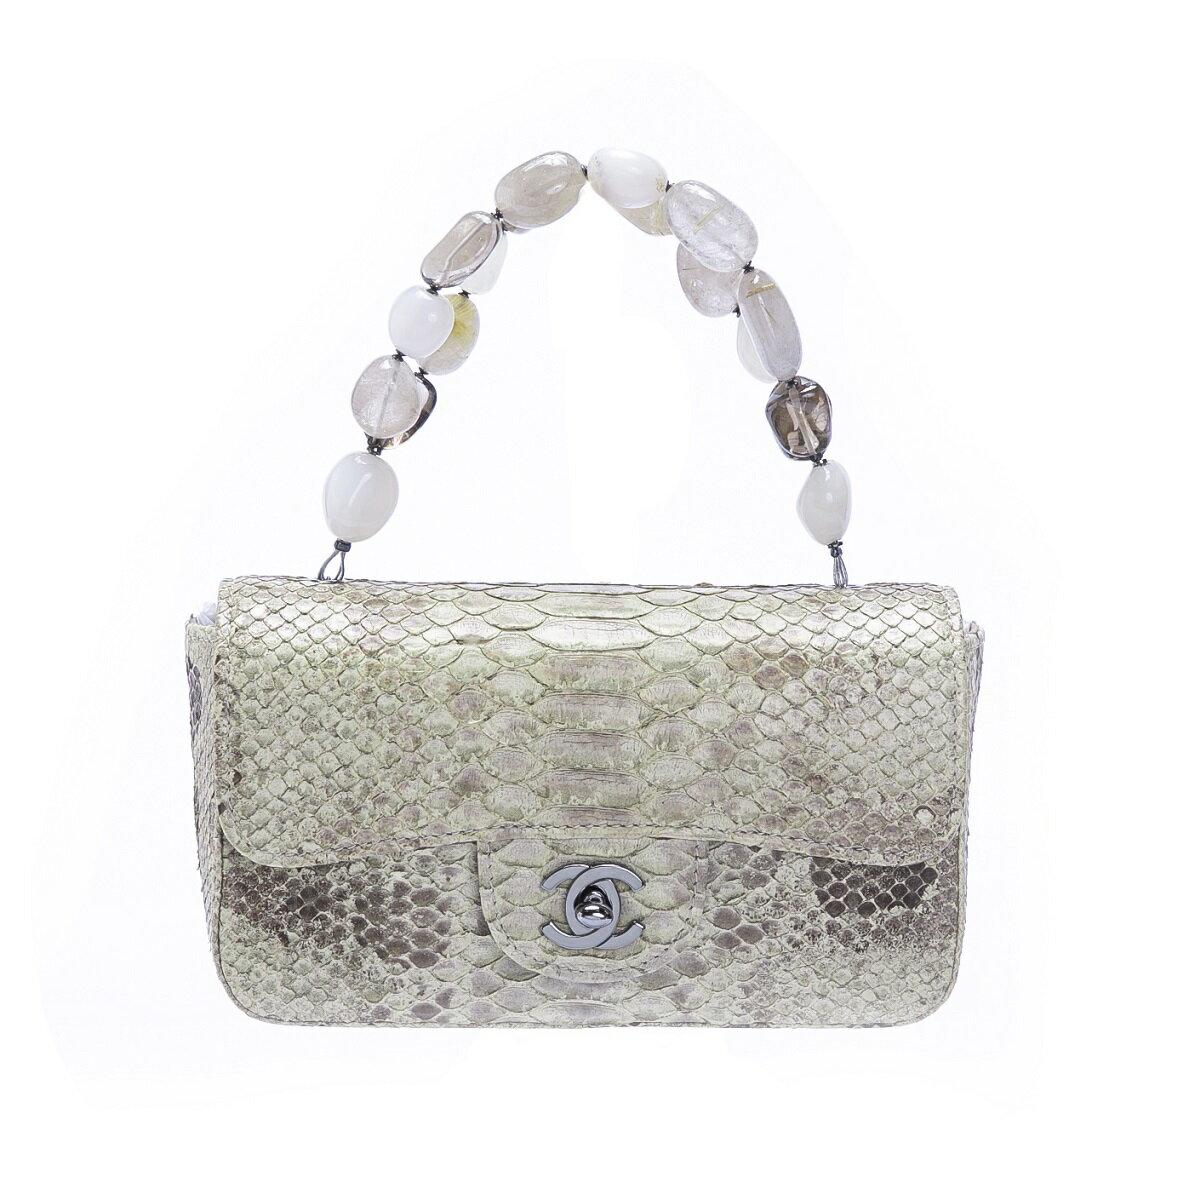 CHANEL Chanel Python Handbag Mini Bag Yellow Beige Stone ☆ Rare ☆ Free Shipping [Treasure Spot] [Used]